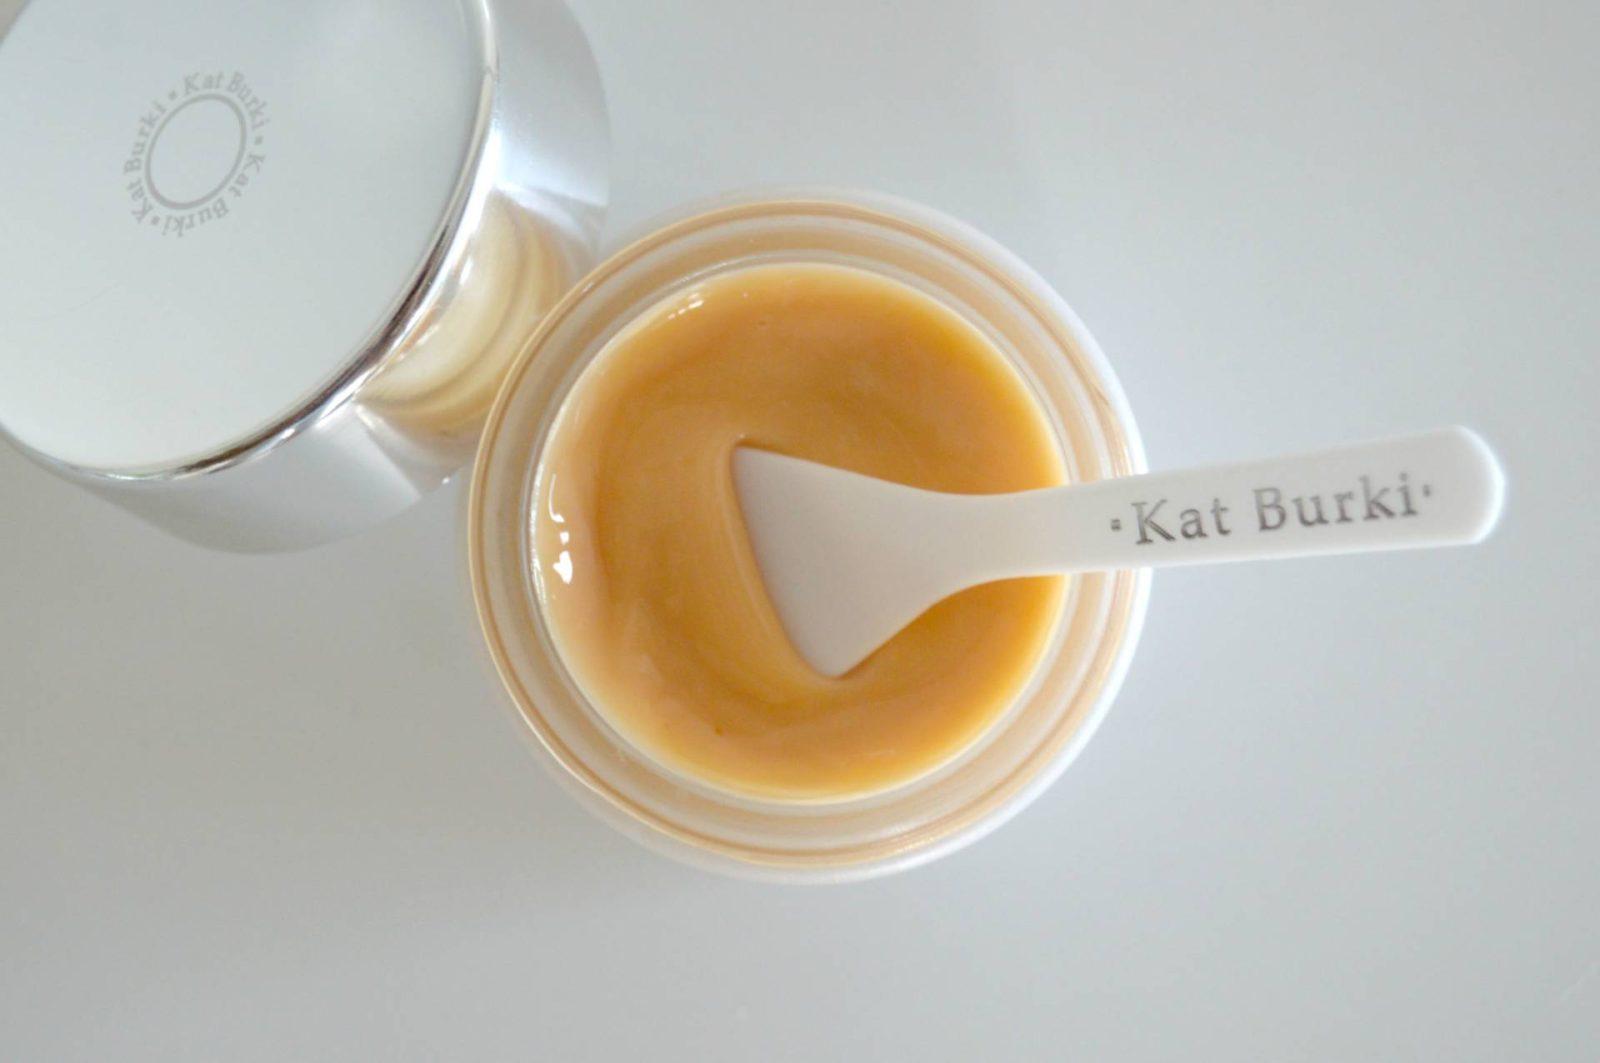 Kat Burki Complete B Bio-Correcting Face Crème